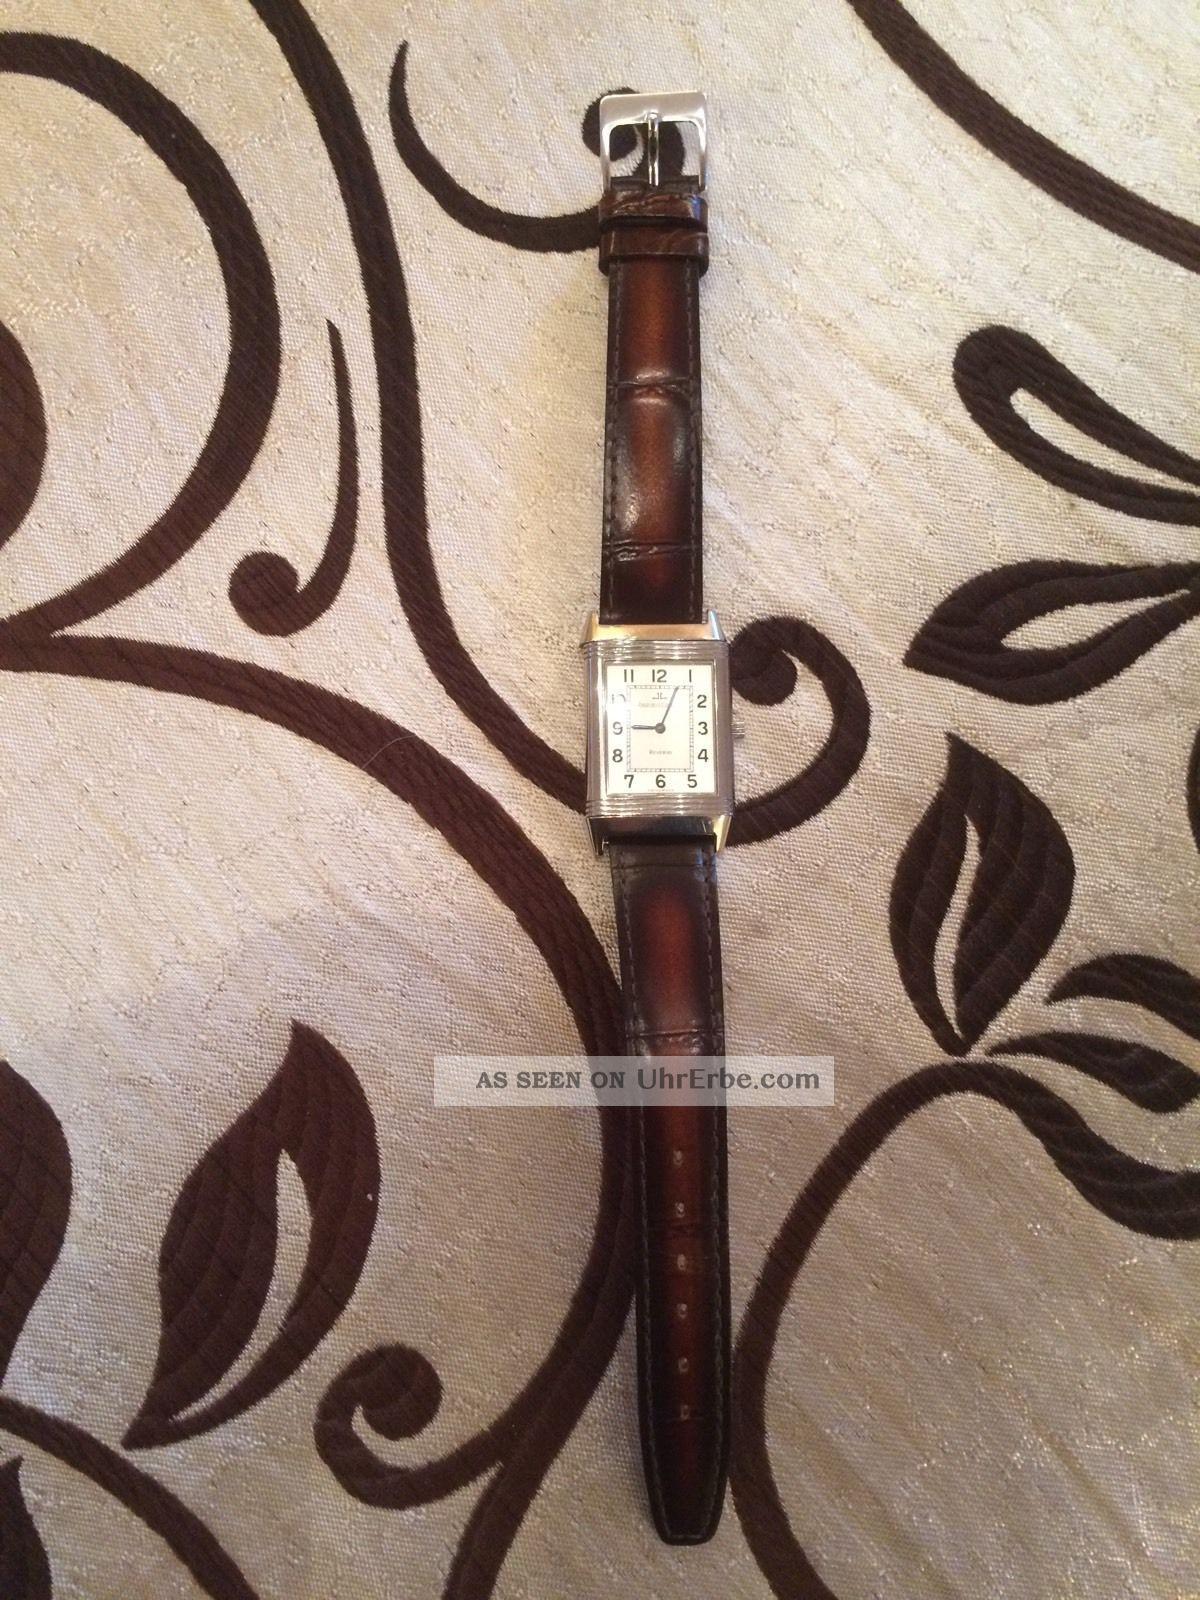 Jaeger - Lecoultre Reverso Edelstahl Handaufzug,  Kd 95,  Zertif. ,  Ovp :250.  8.  86 Armbanduhren Bild